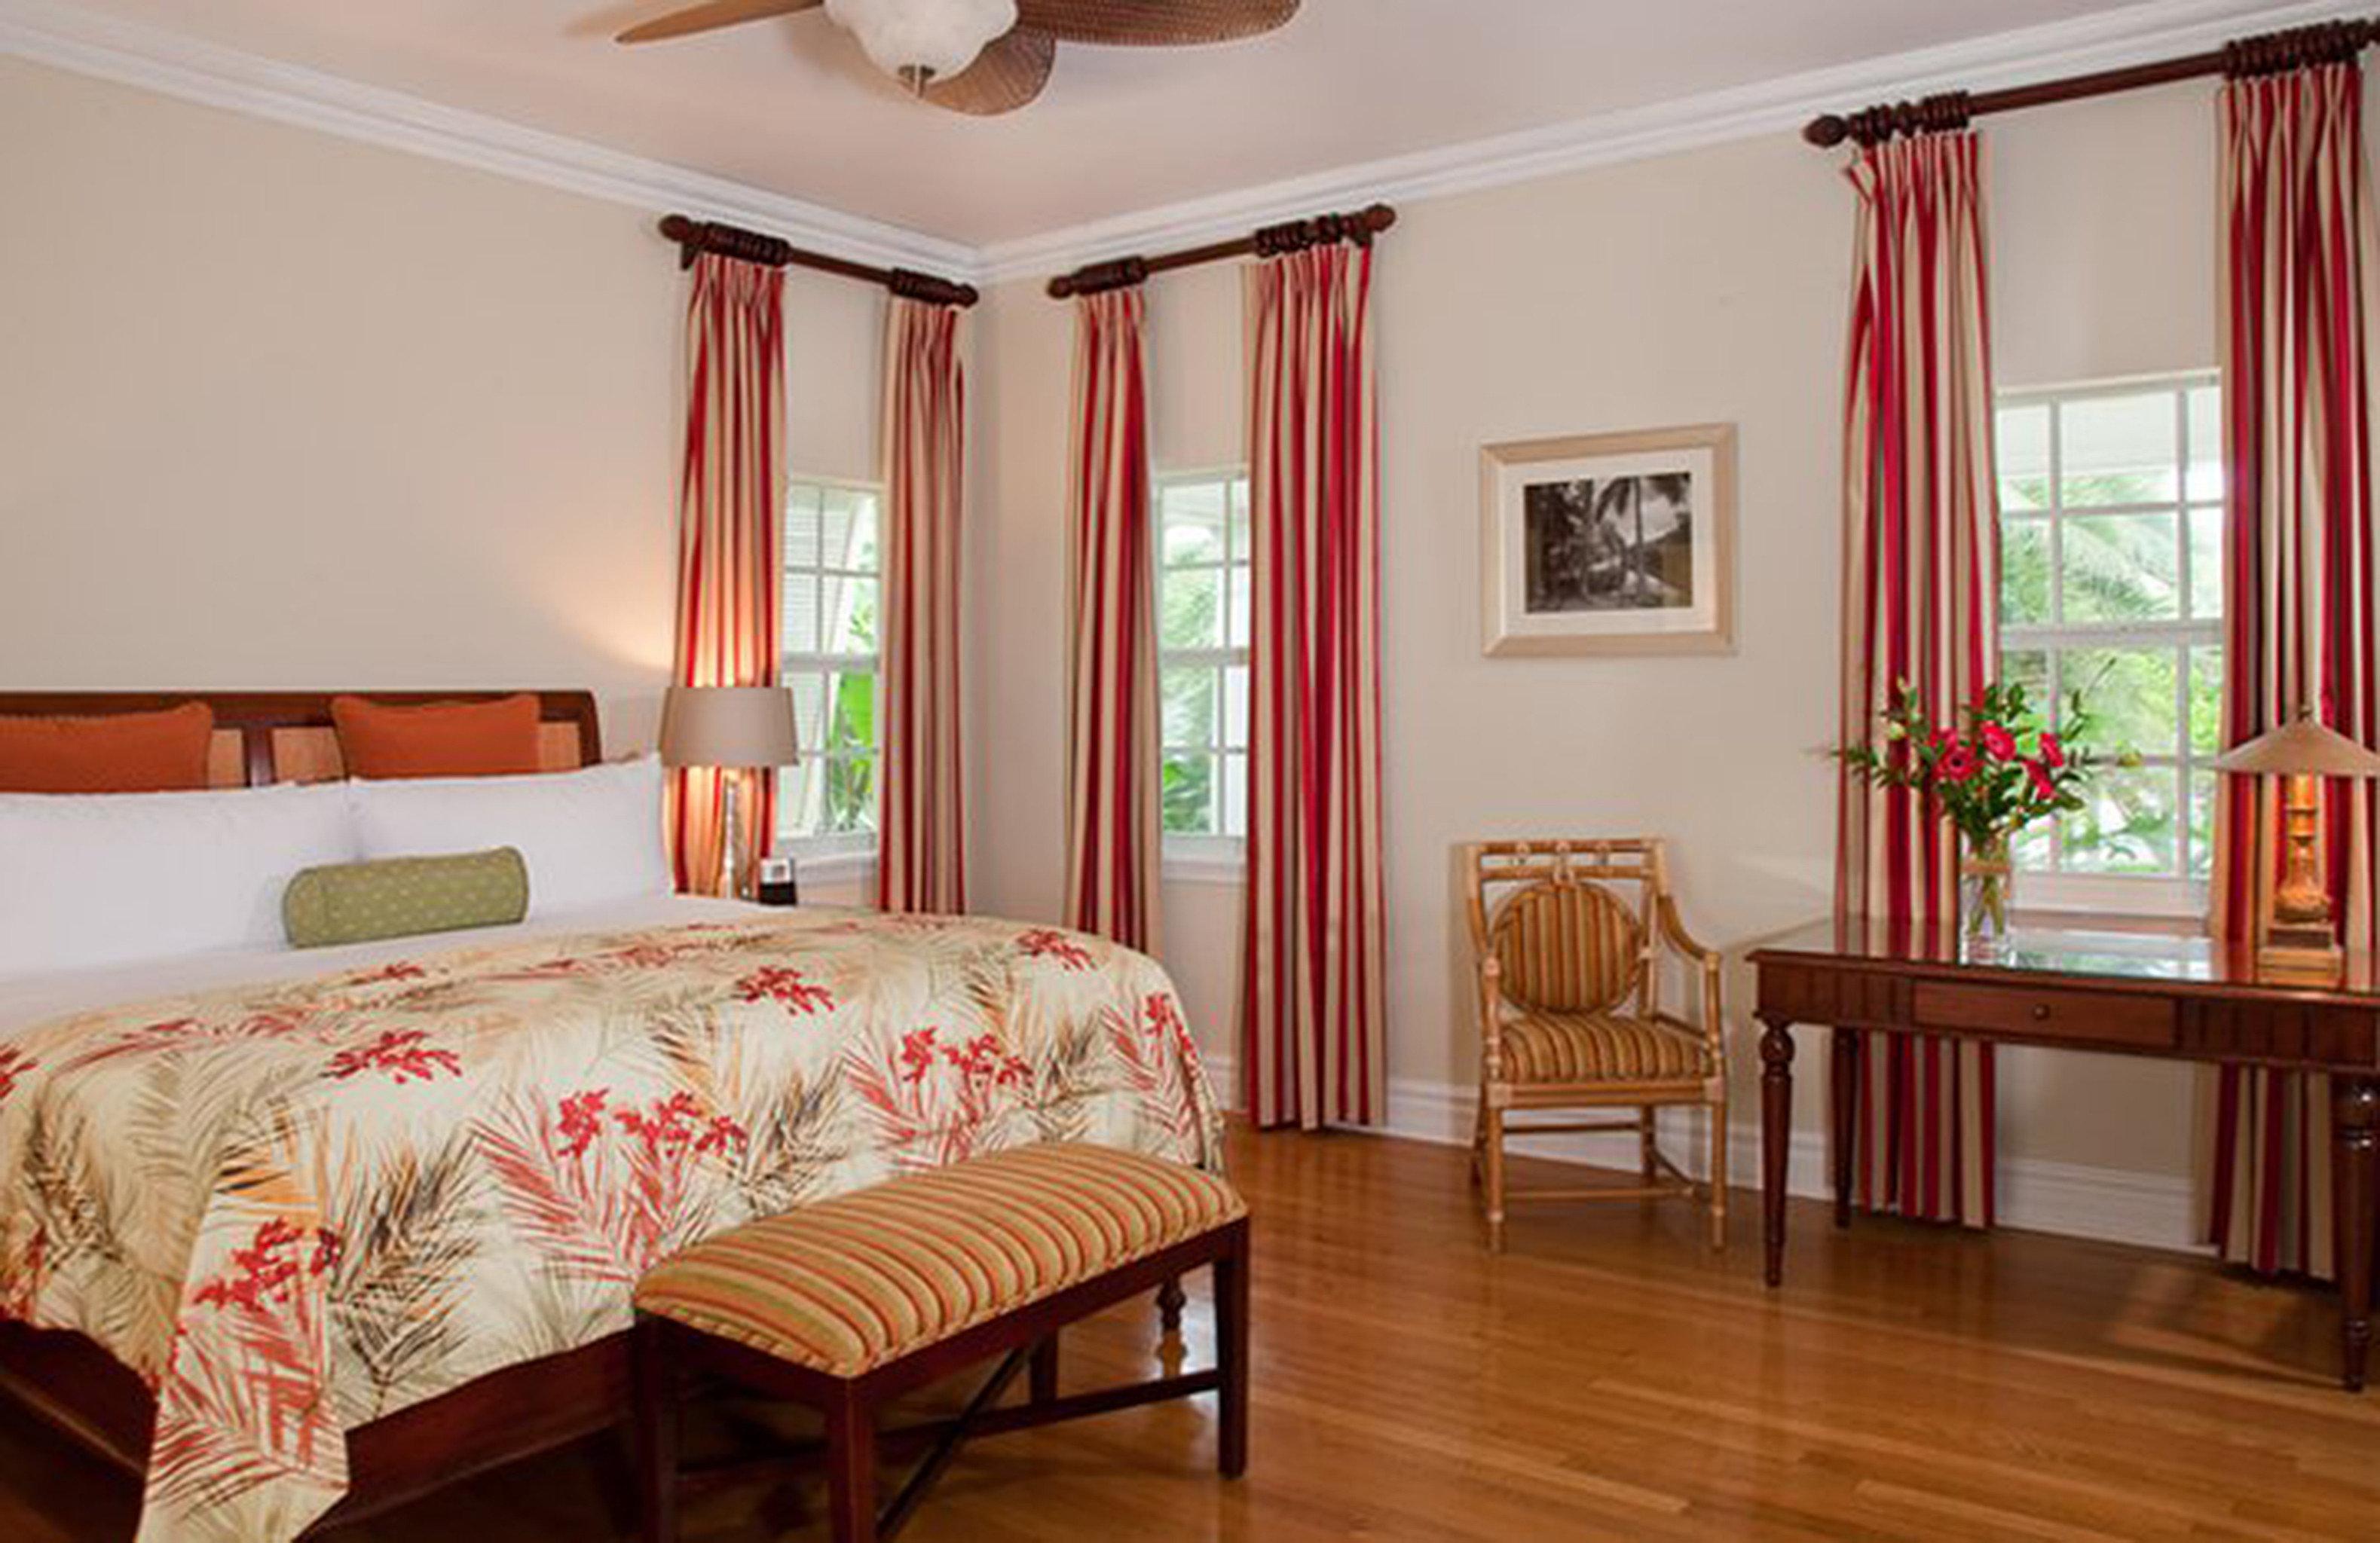 Bedroom Historic Luxury Suite property hardwood home cottage living room Villa farmhouse